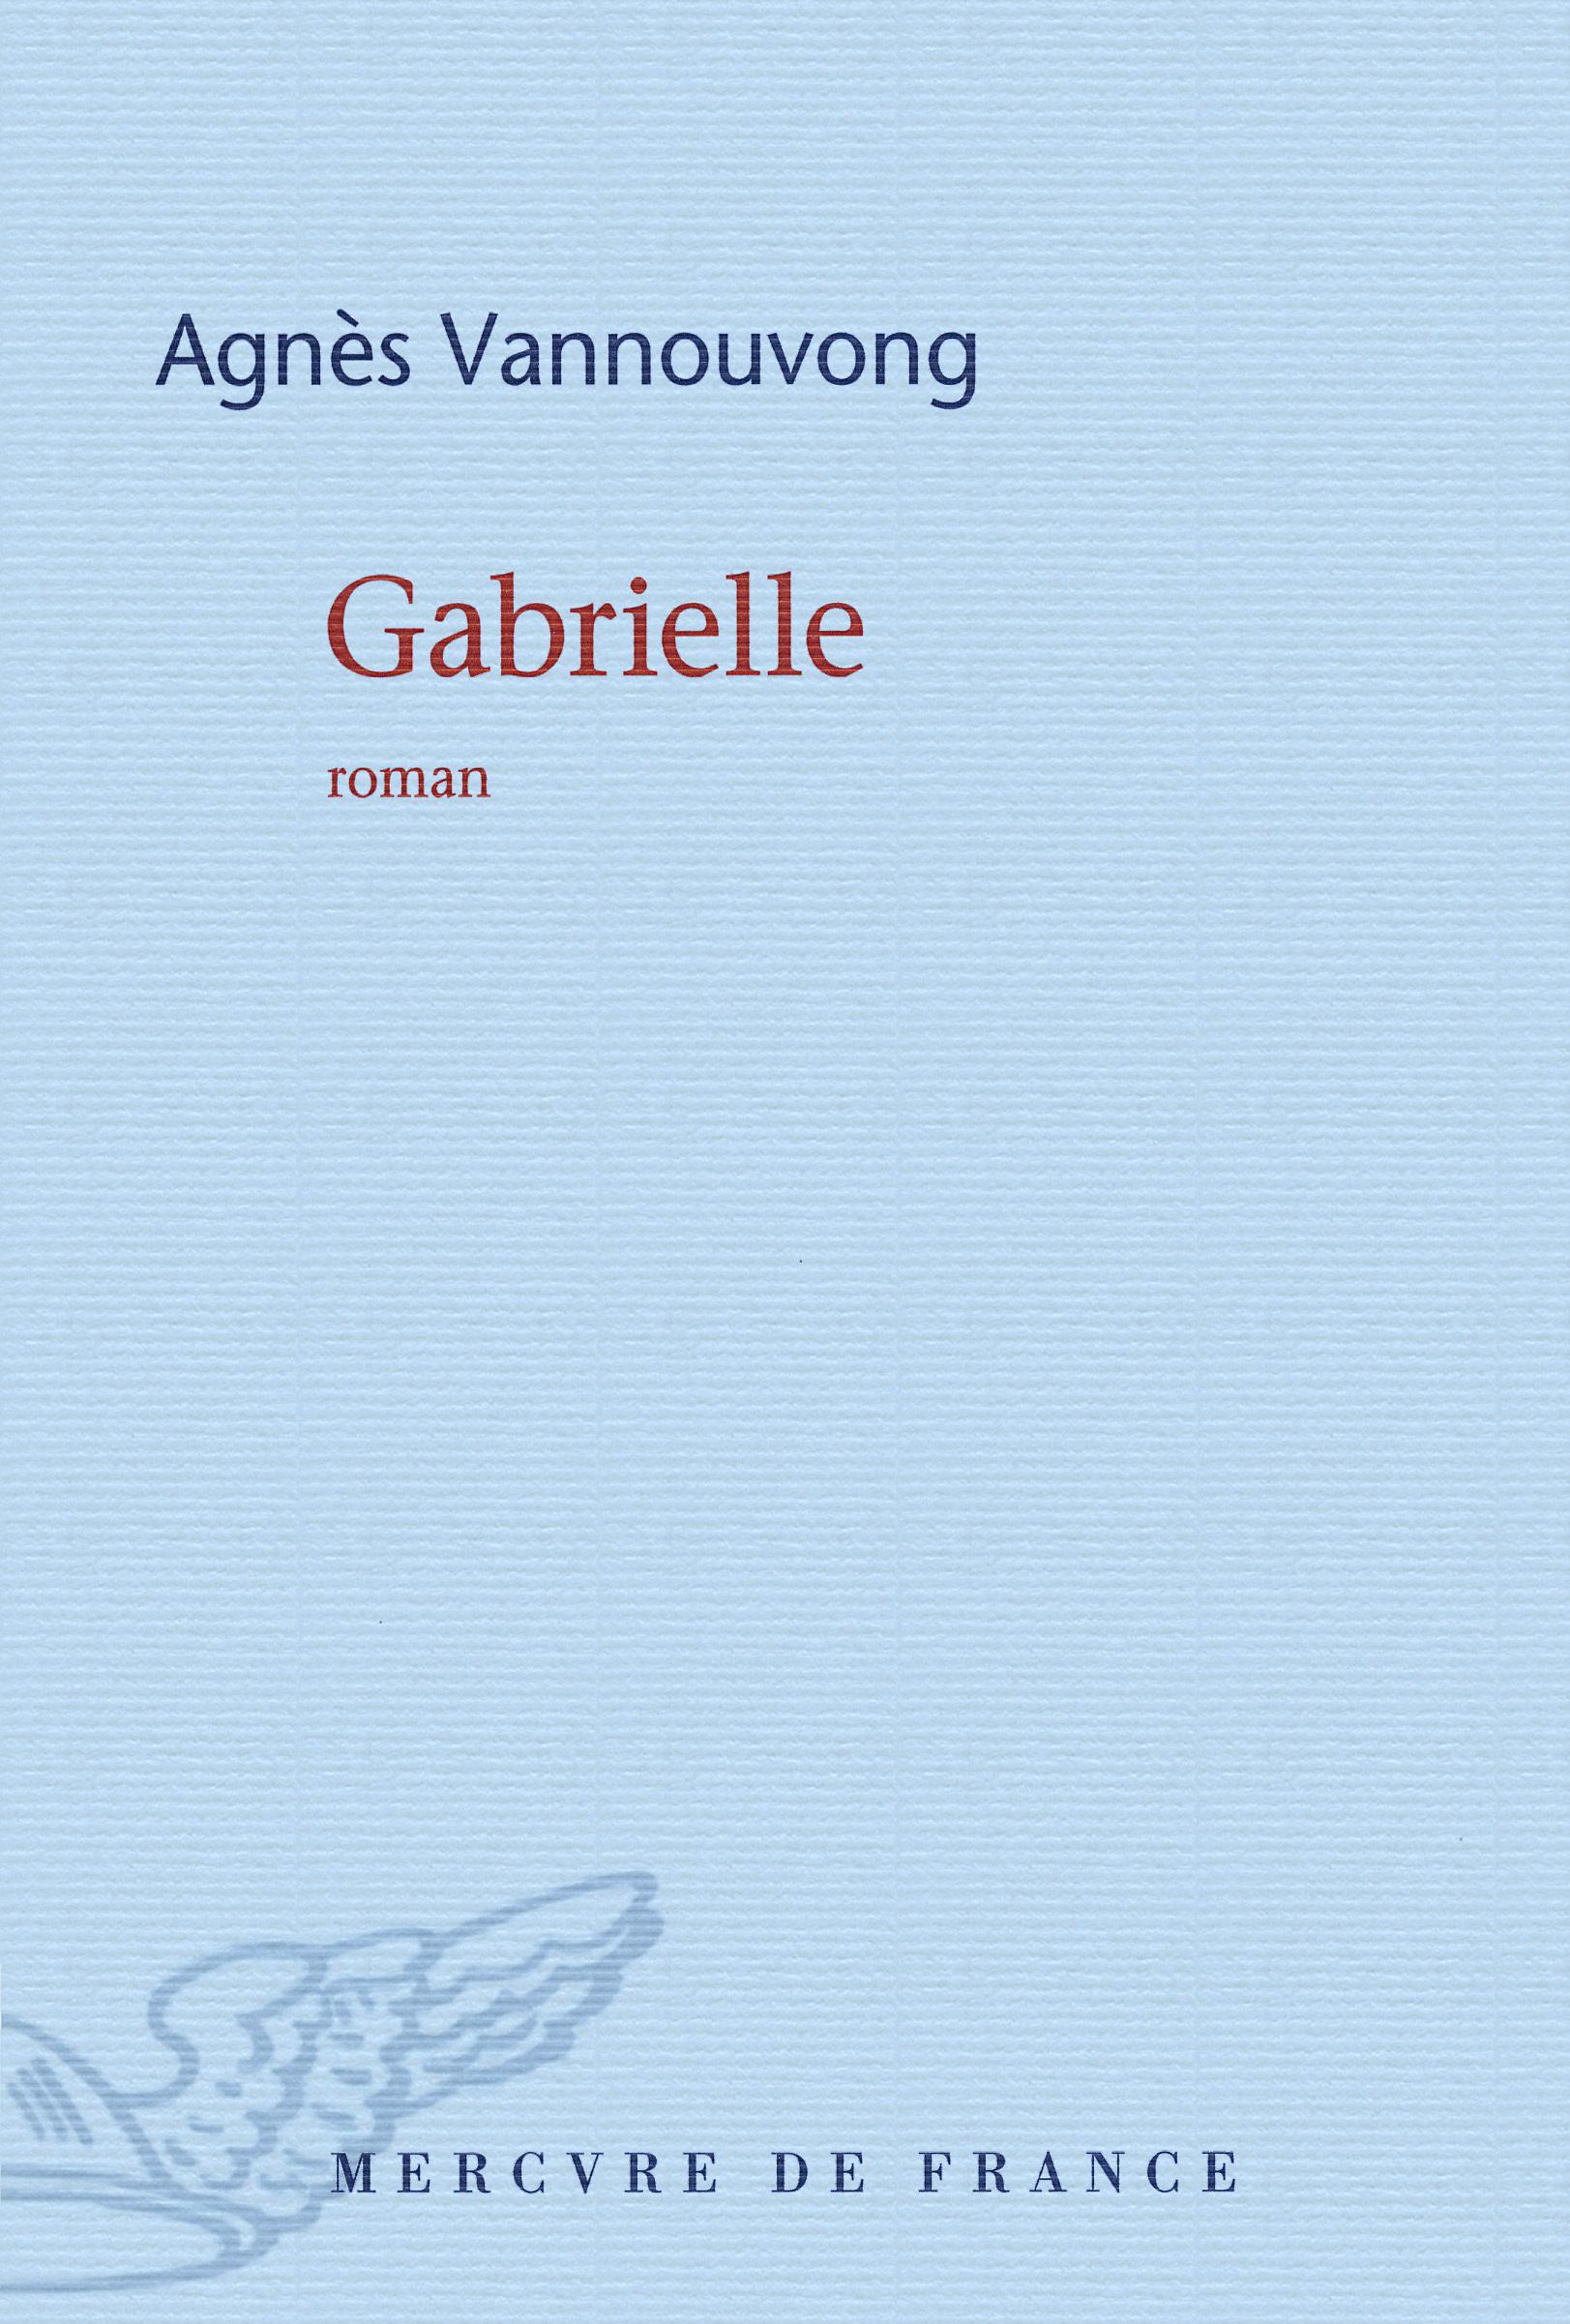 GABRIELLE ROMAN